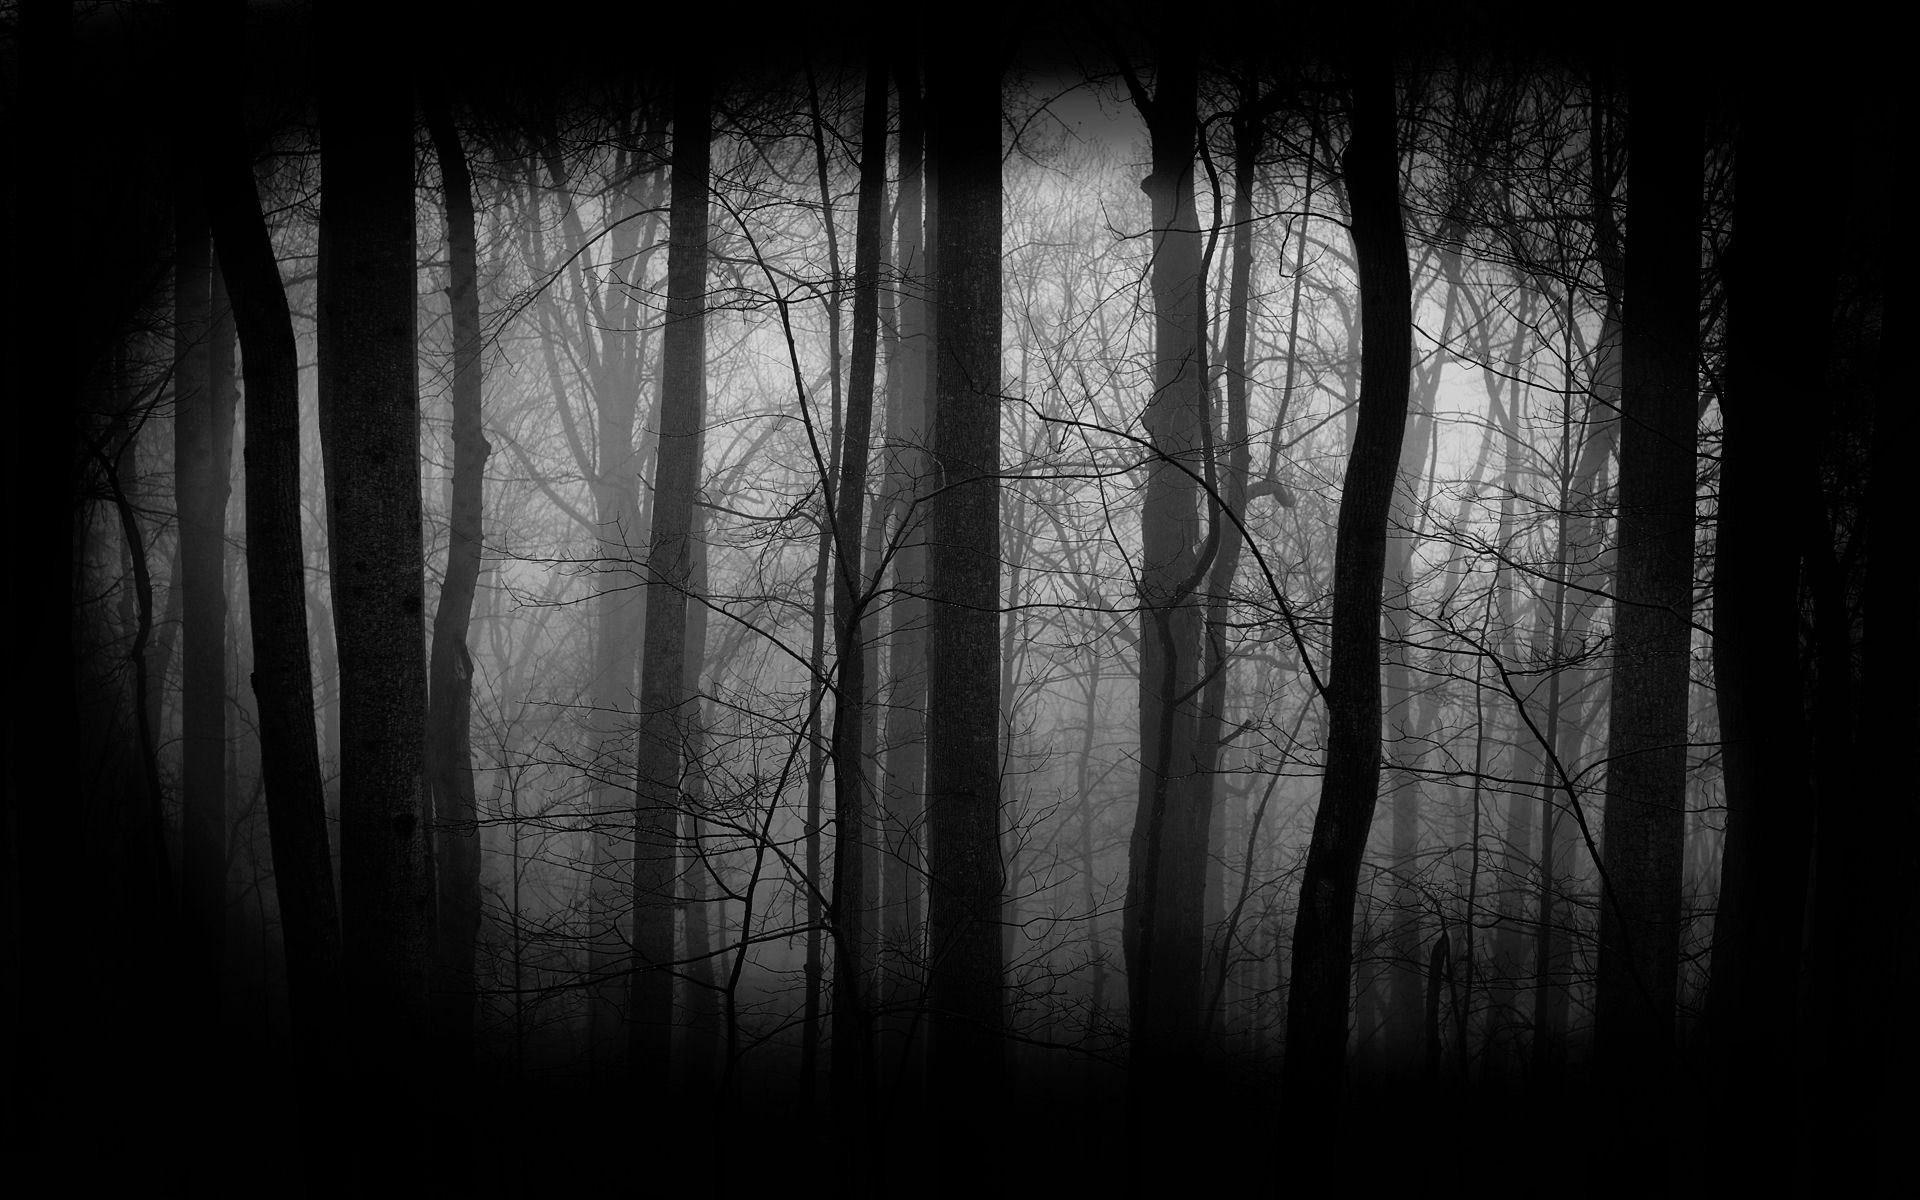 CreepyPasta Radio – The creepiest radiostation online